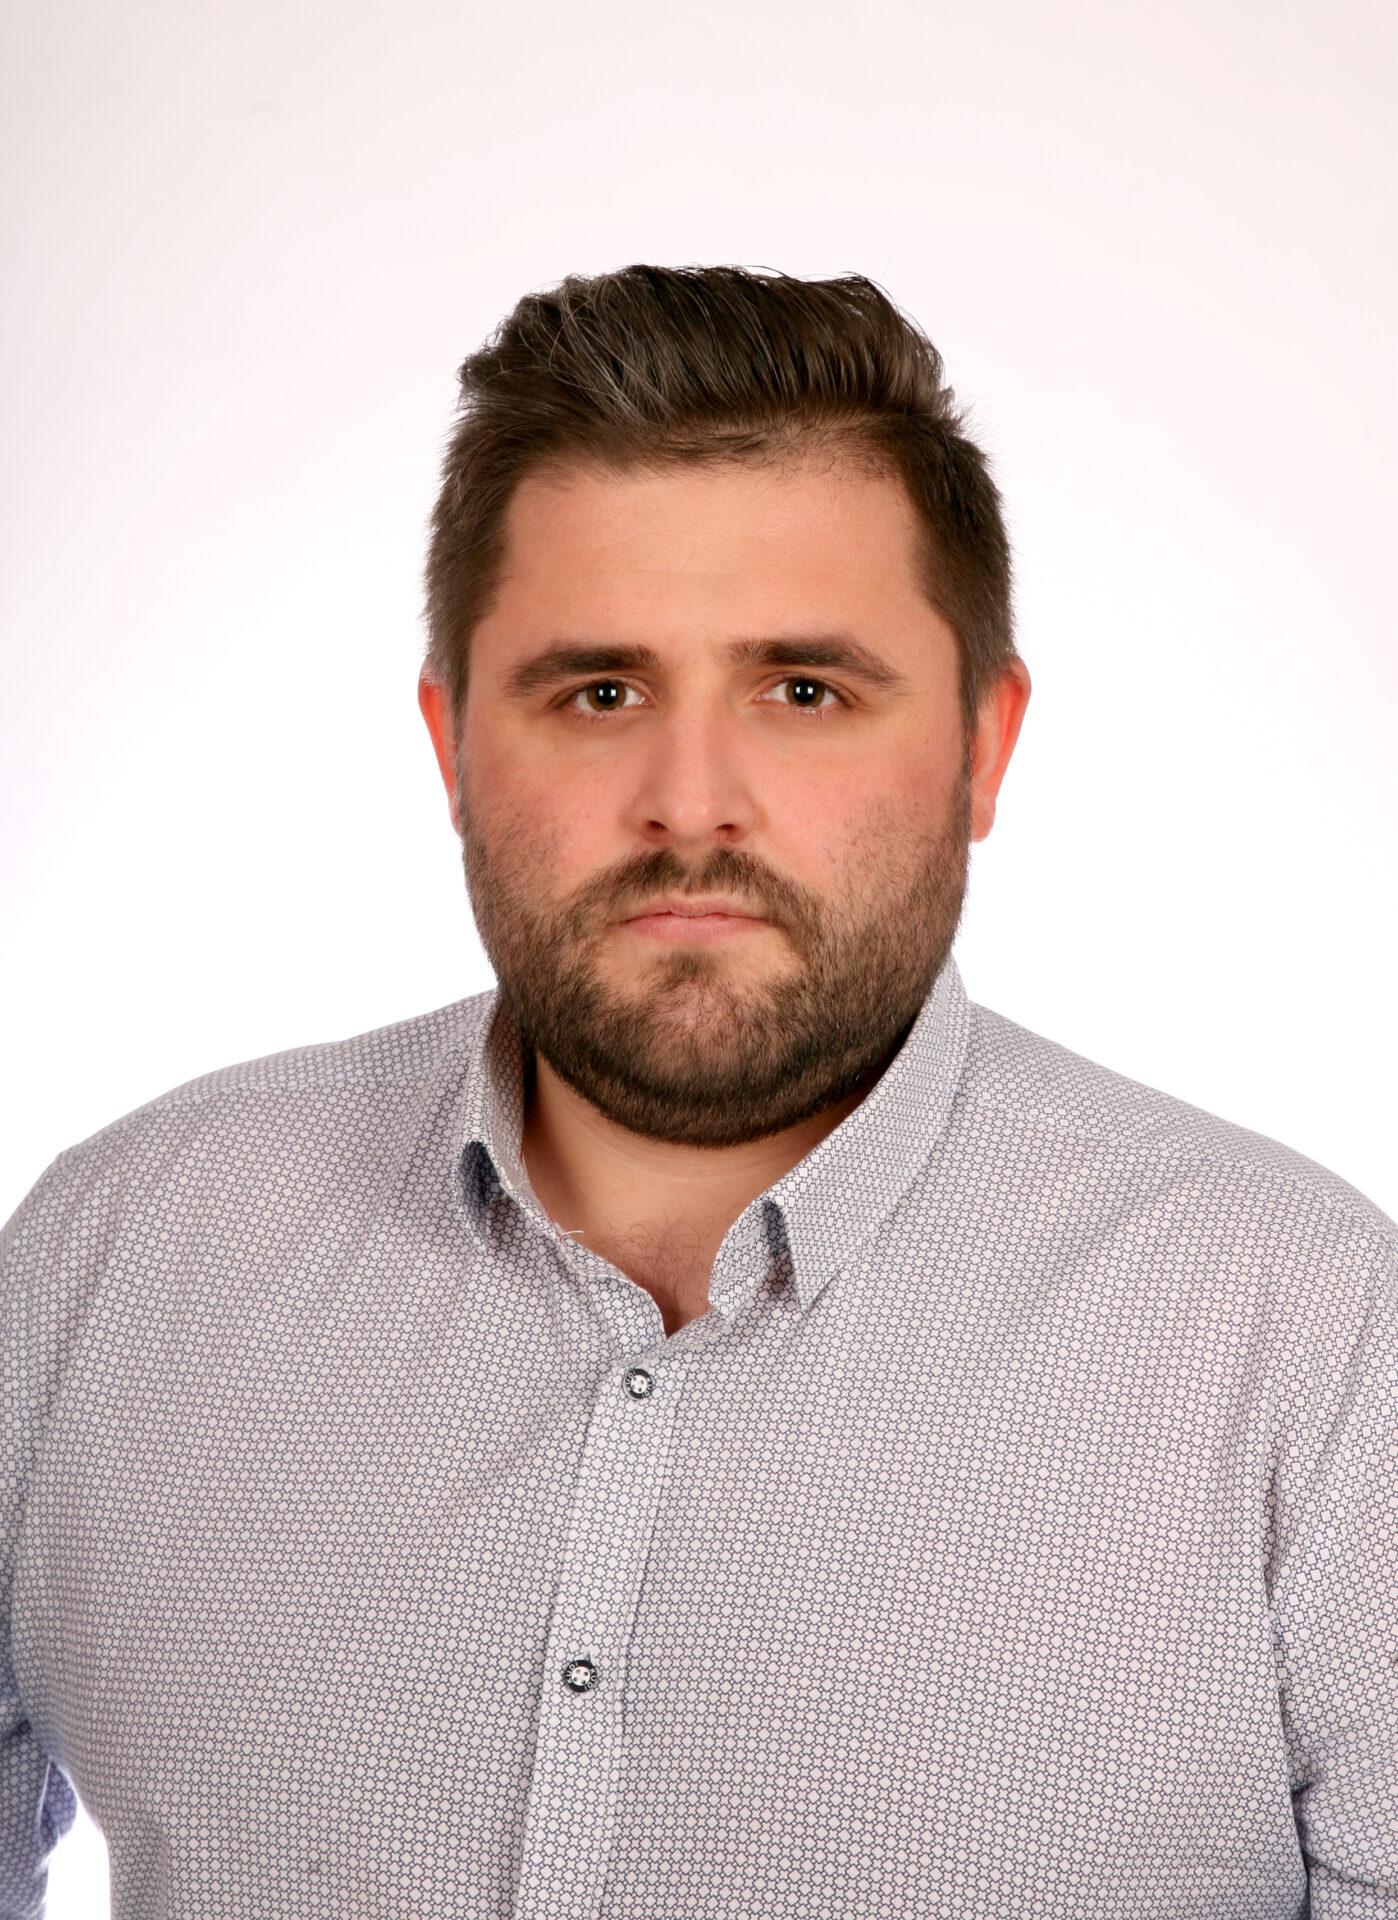 Adam Przewoźnik<br /><p>Handlowiec (Trader)</p>